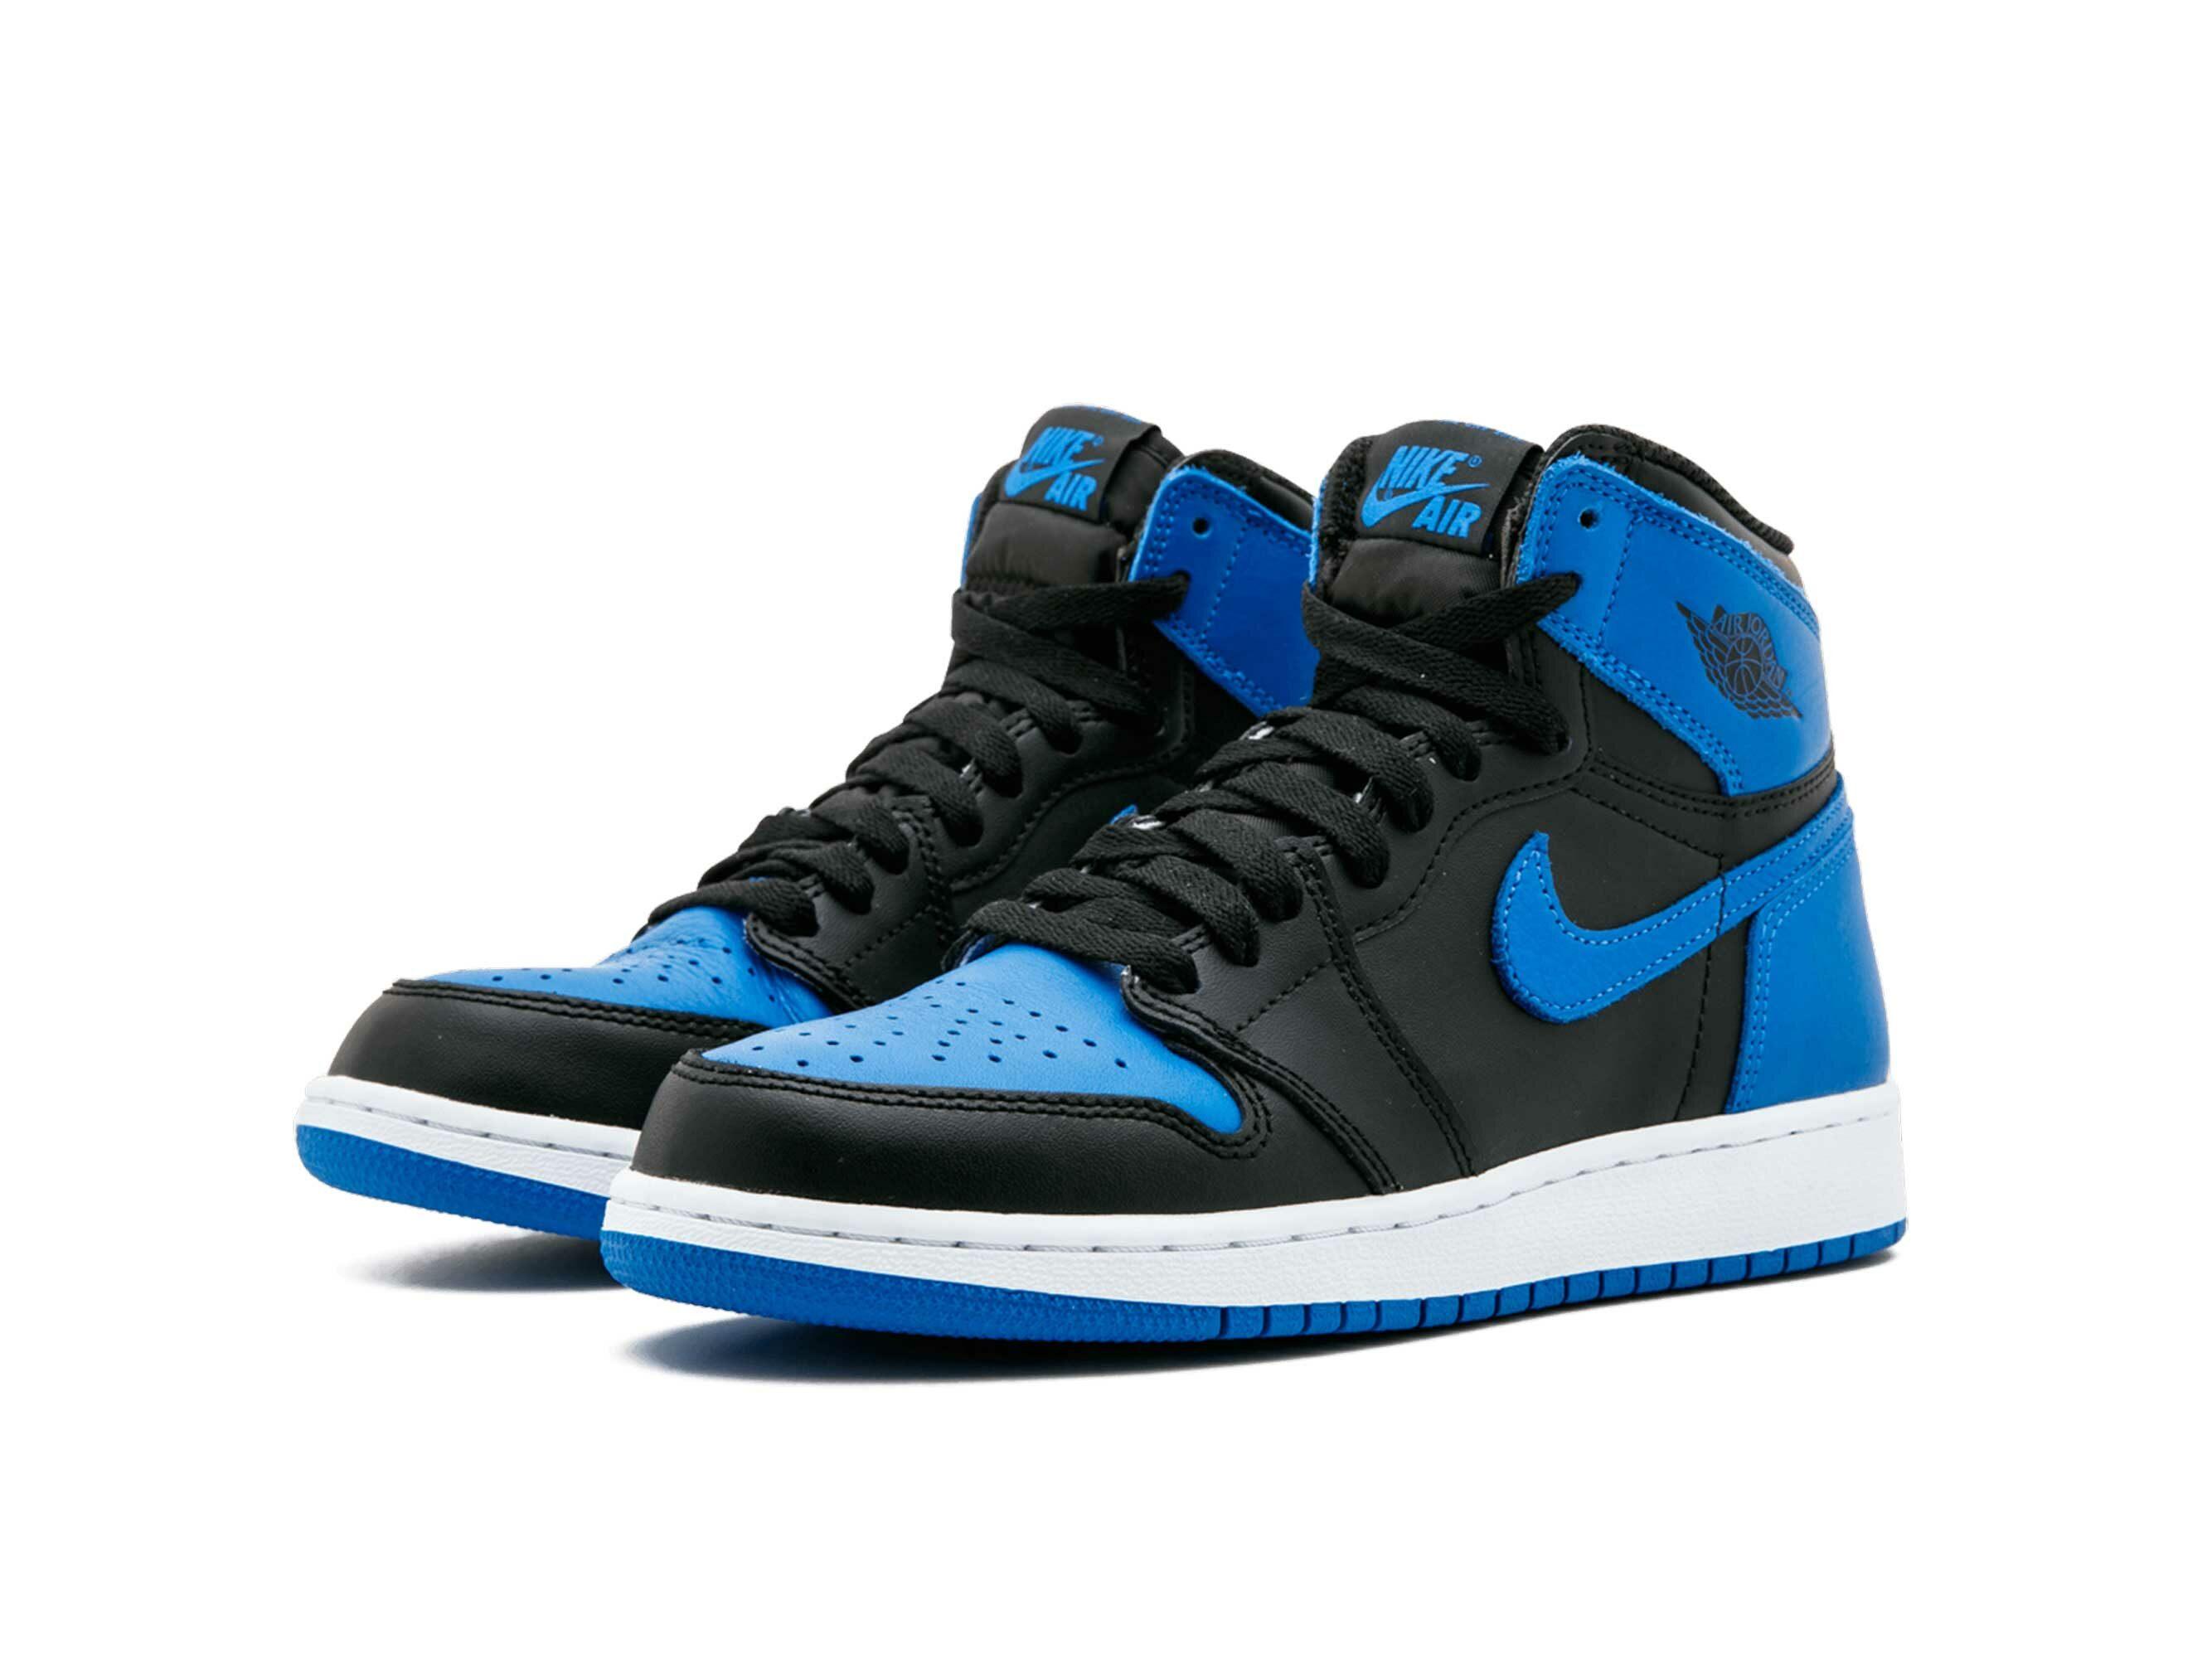 nike air Jordan 1 retro high og bg 575441_007 купить